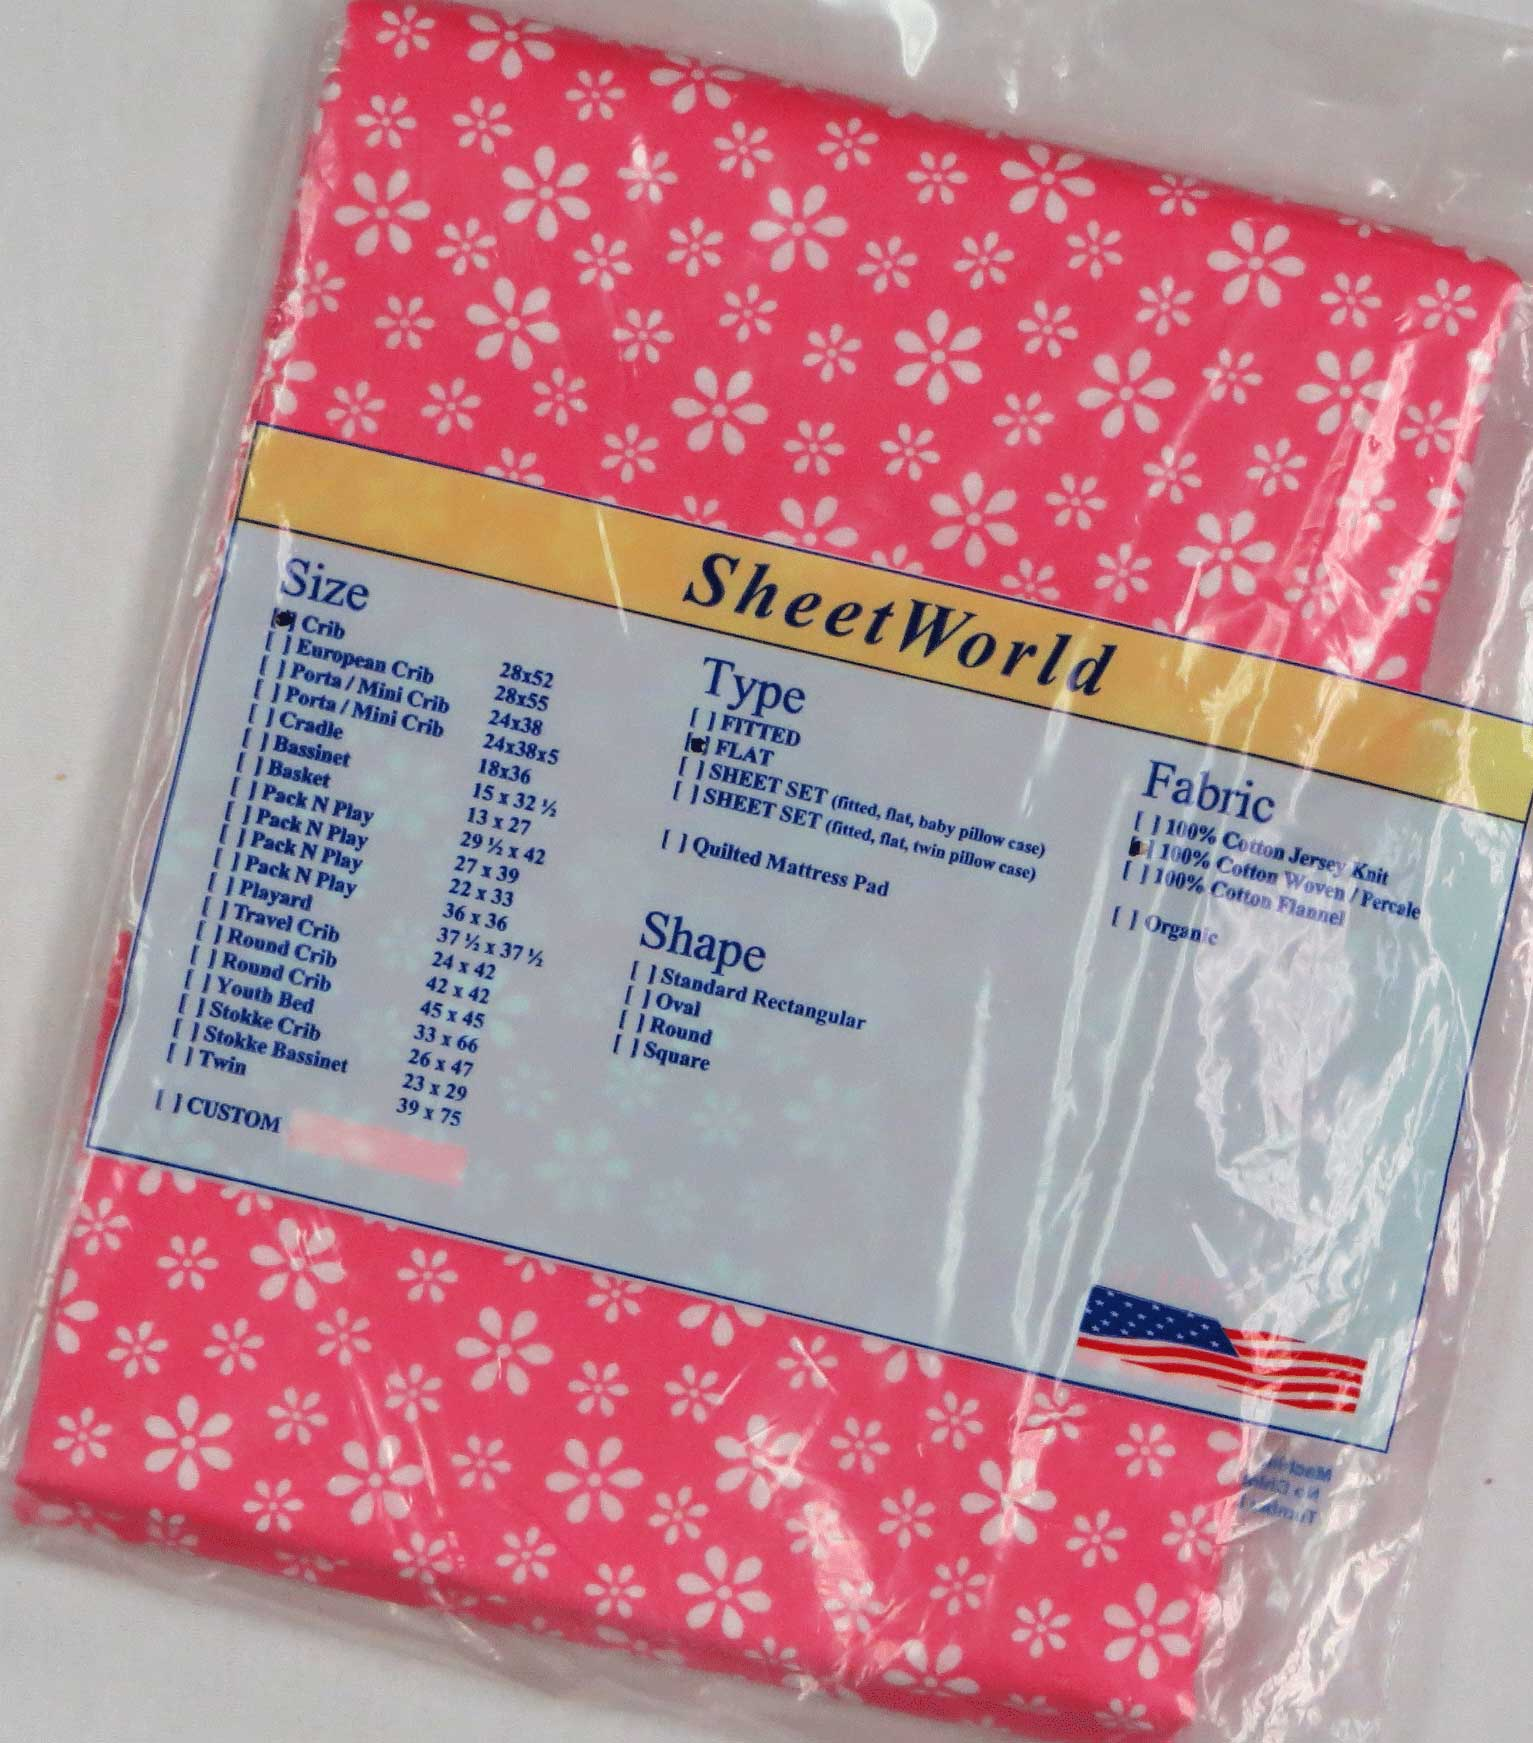 Floral Pink Cotton FLAT / TOP Crib Sheet - 68 x 44